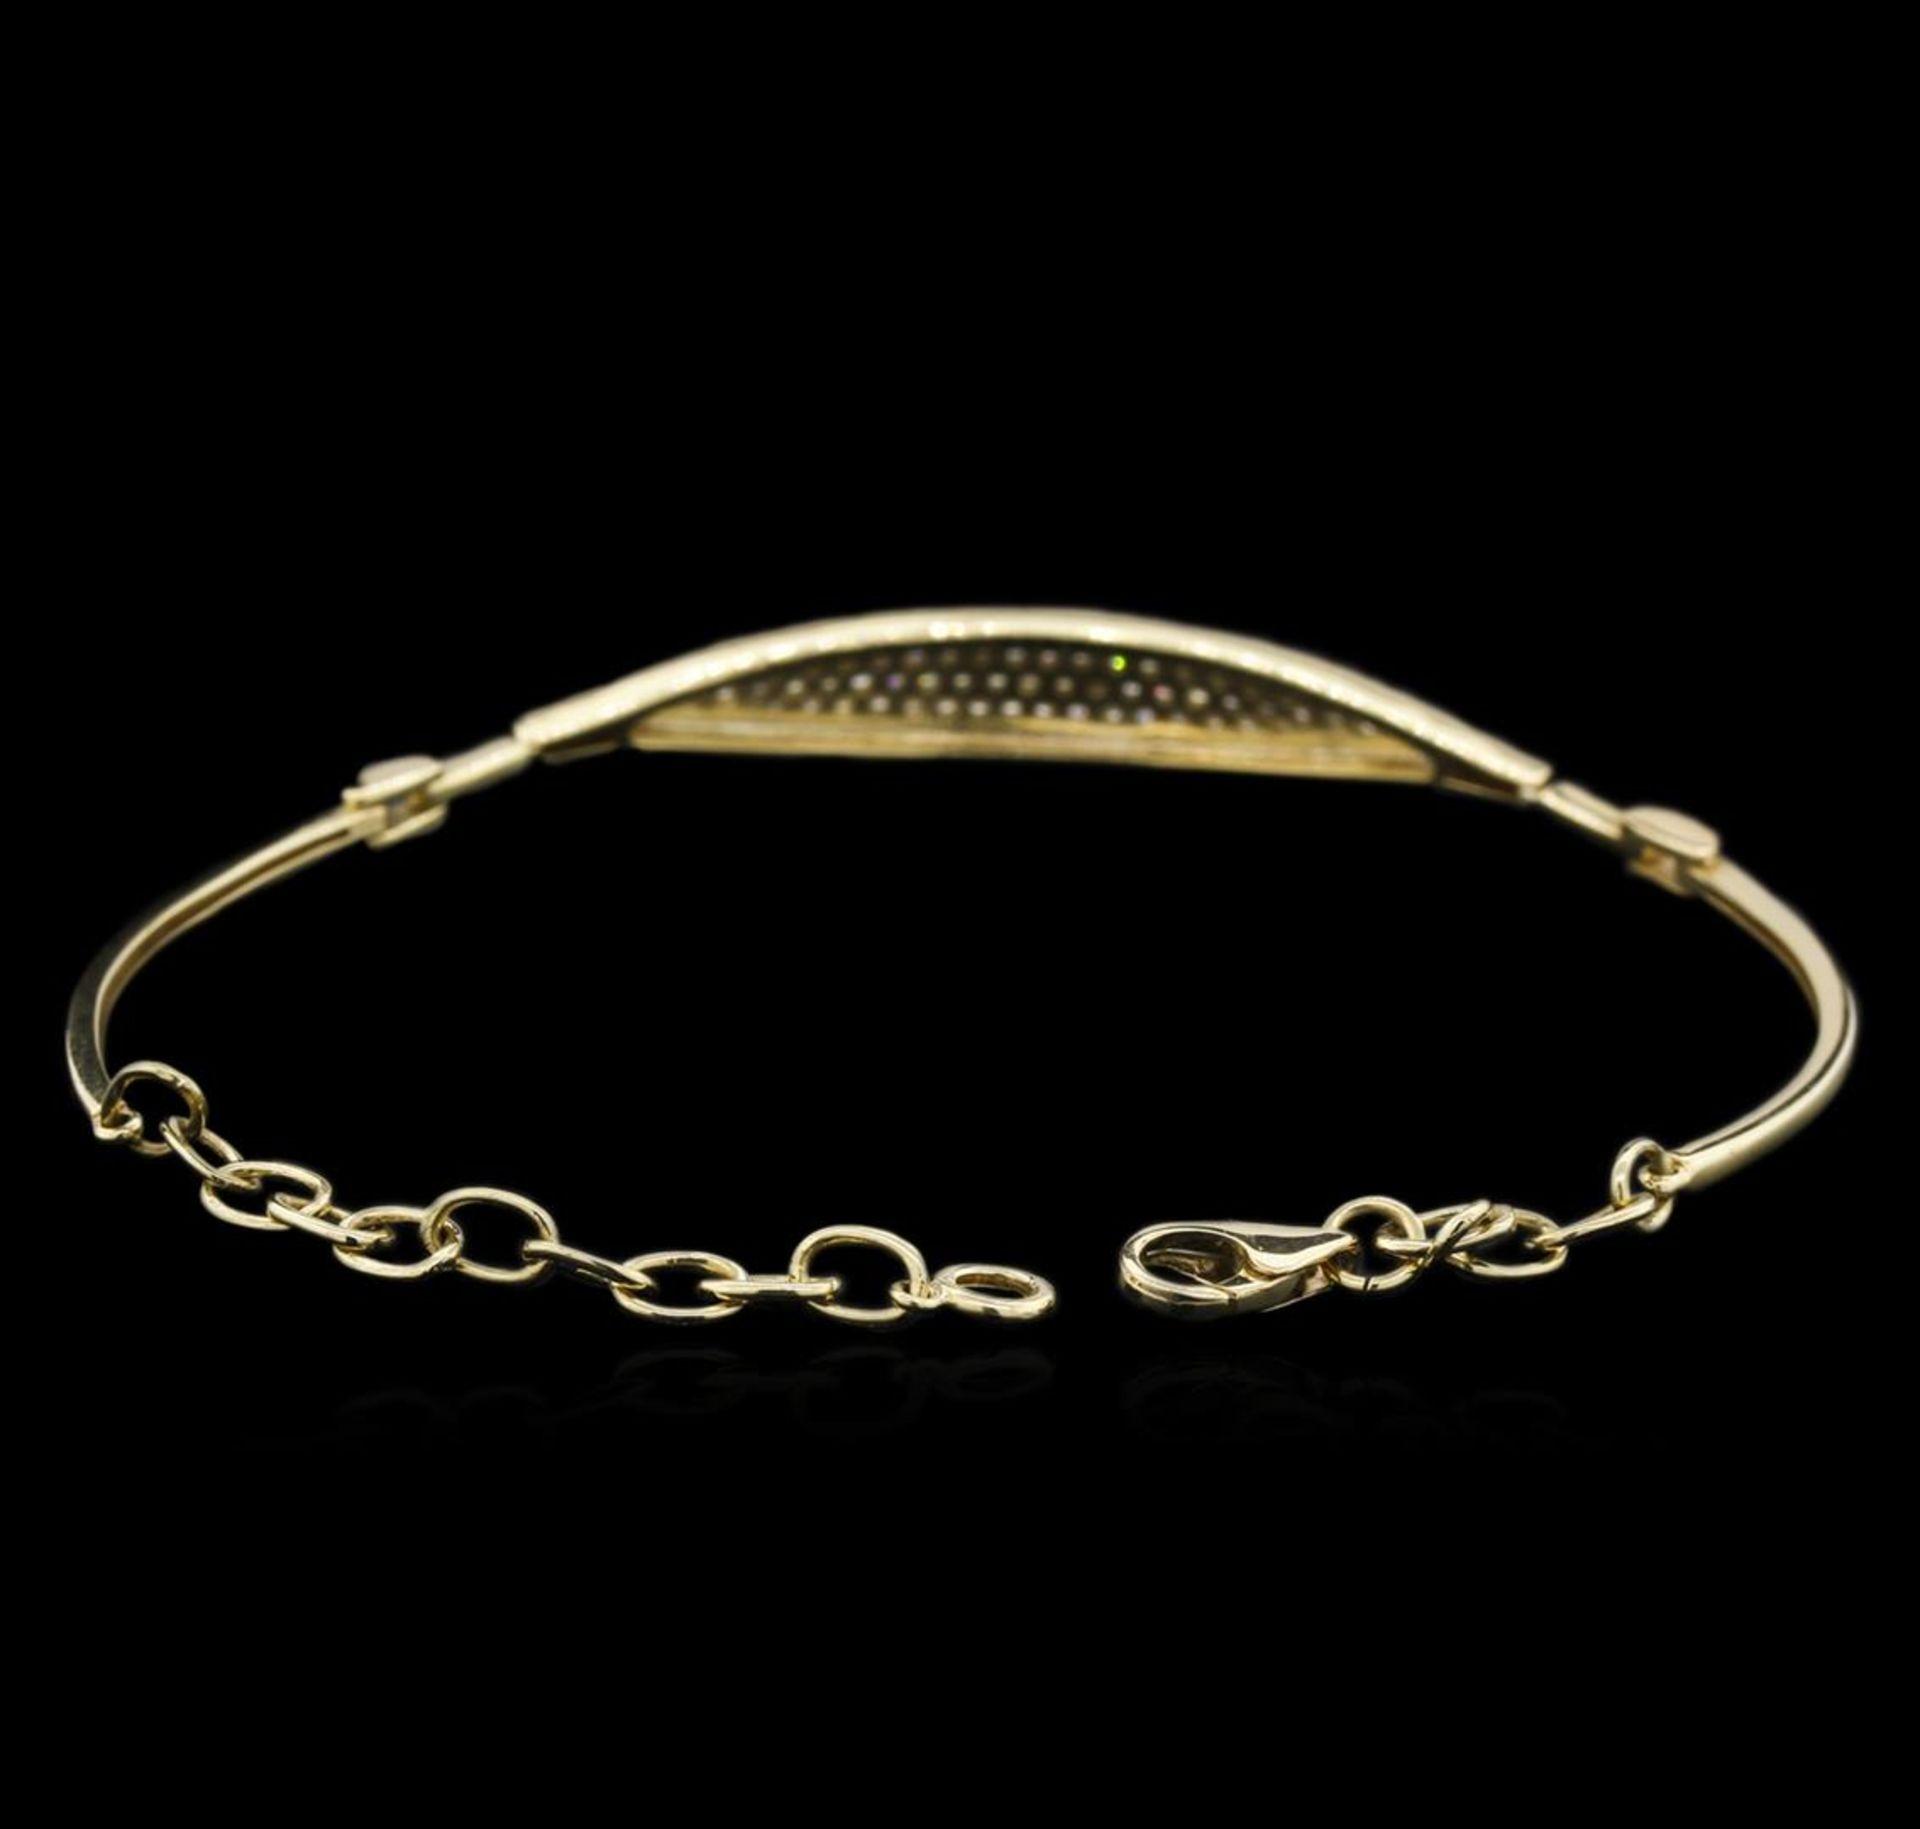 0.33 ctw Diamond Bracelet - 14KT Yellow Gold - Image 3 of 3